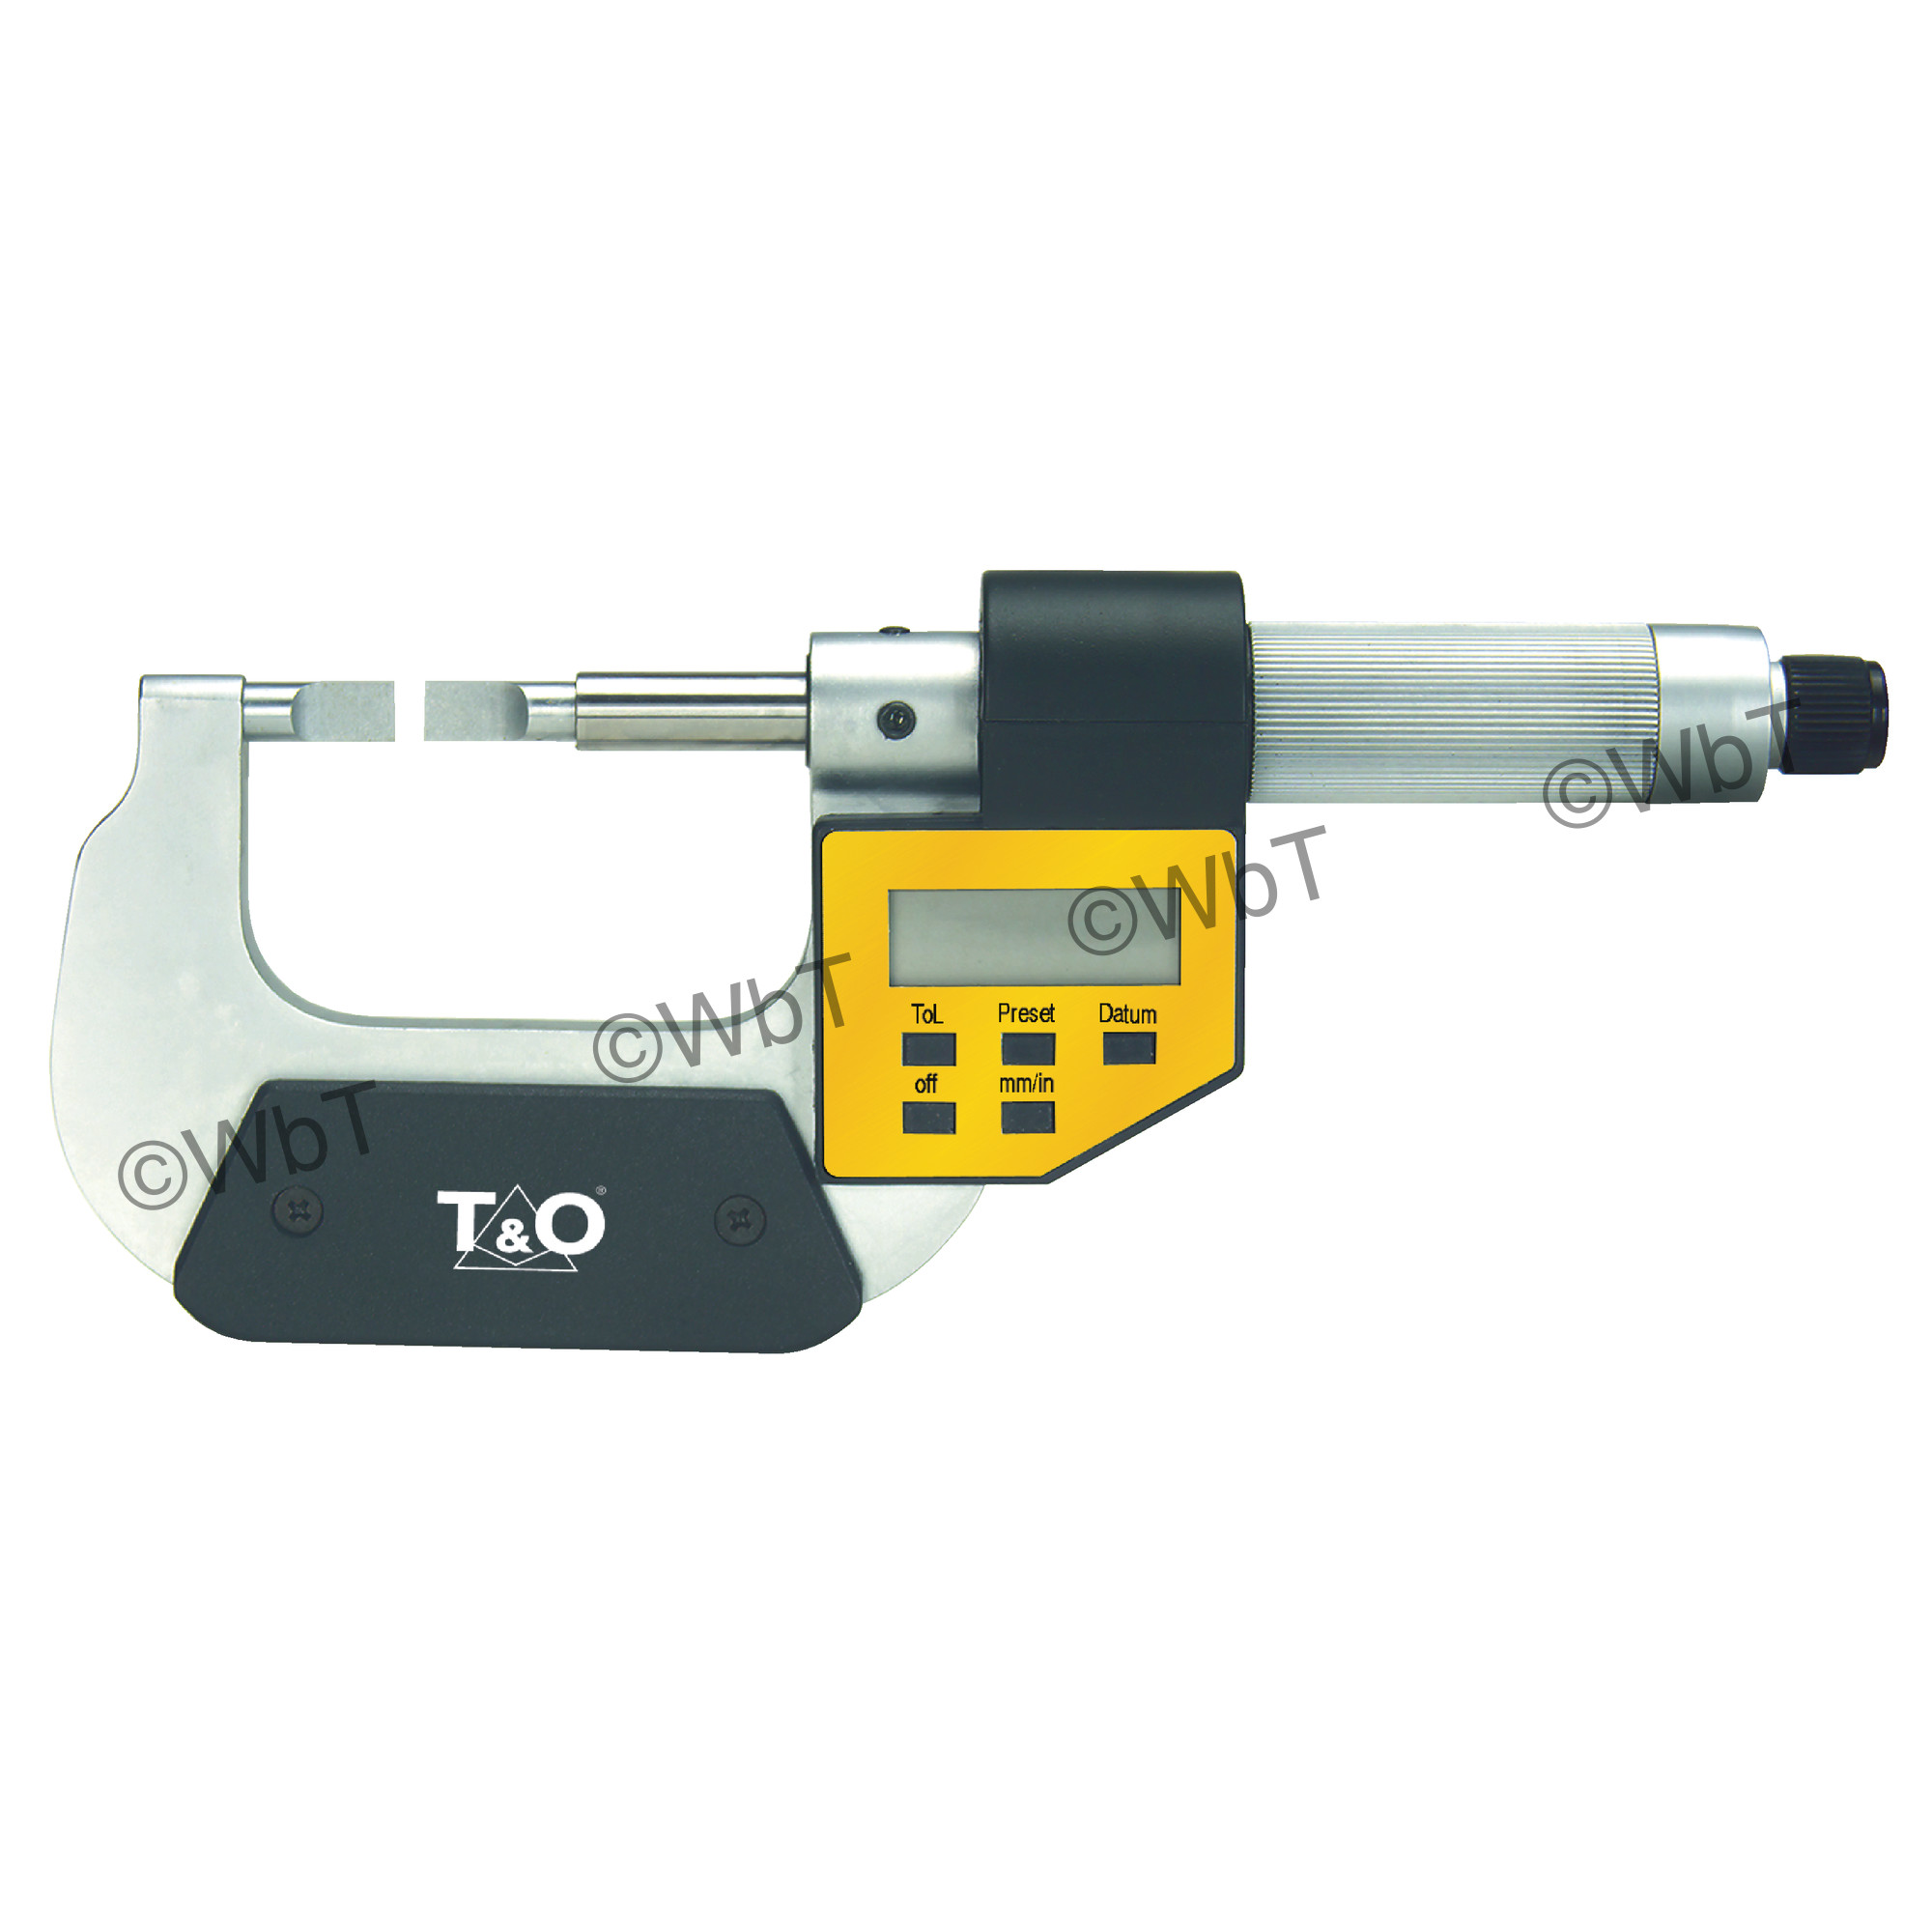 "0~1"" Electronic Blade Type Micrometer"